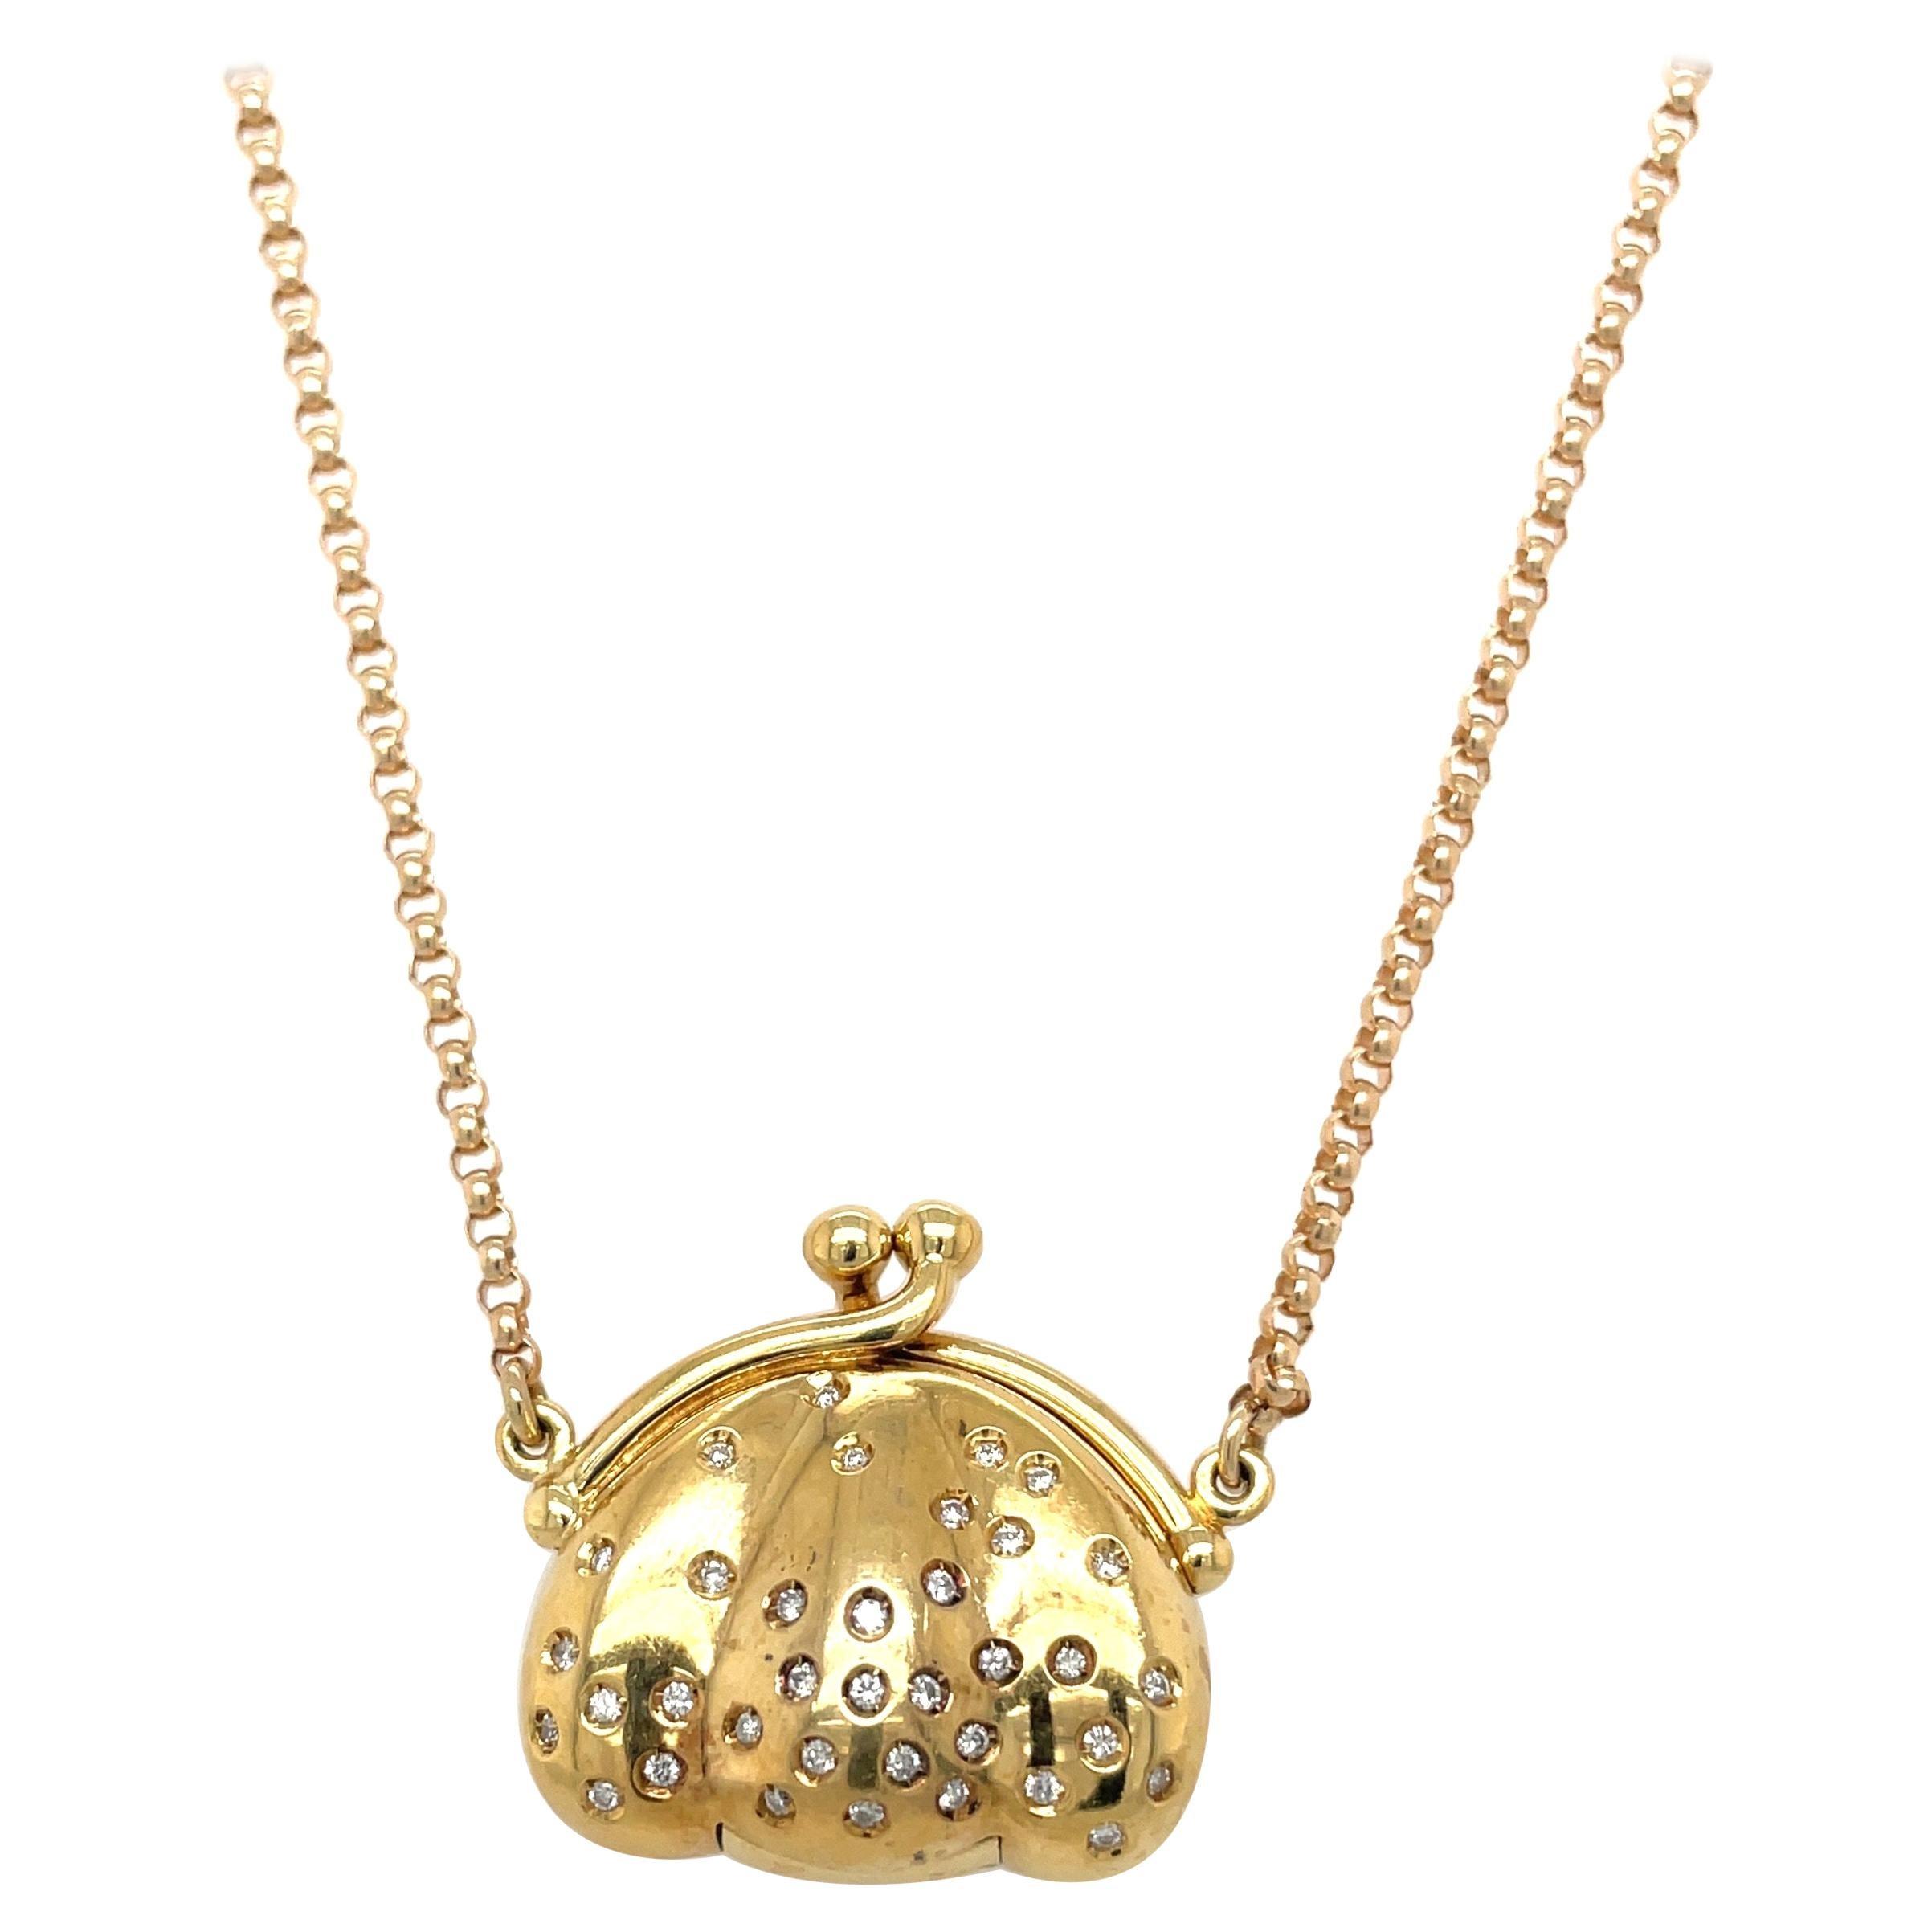 Stephan Hafner 18kt Yellow Gold, .20ct Diamond Pocketbook Pendant Necklace